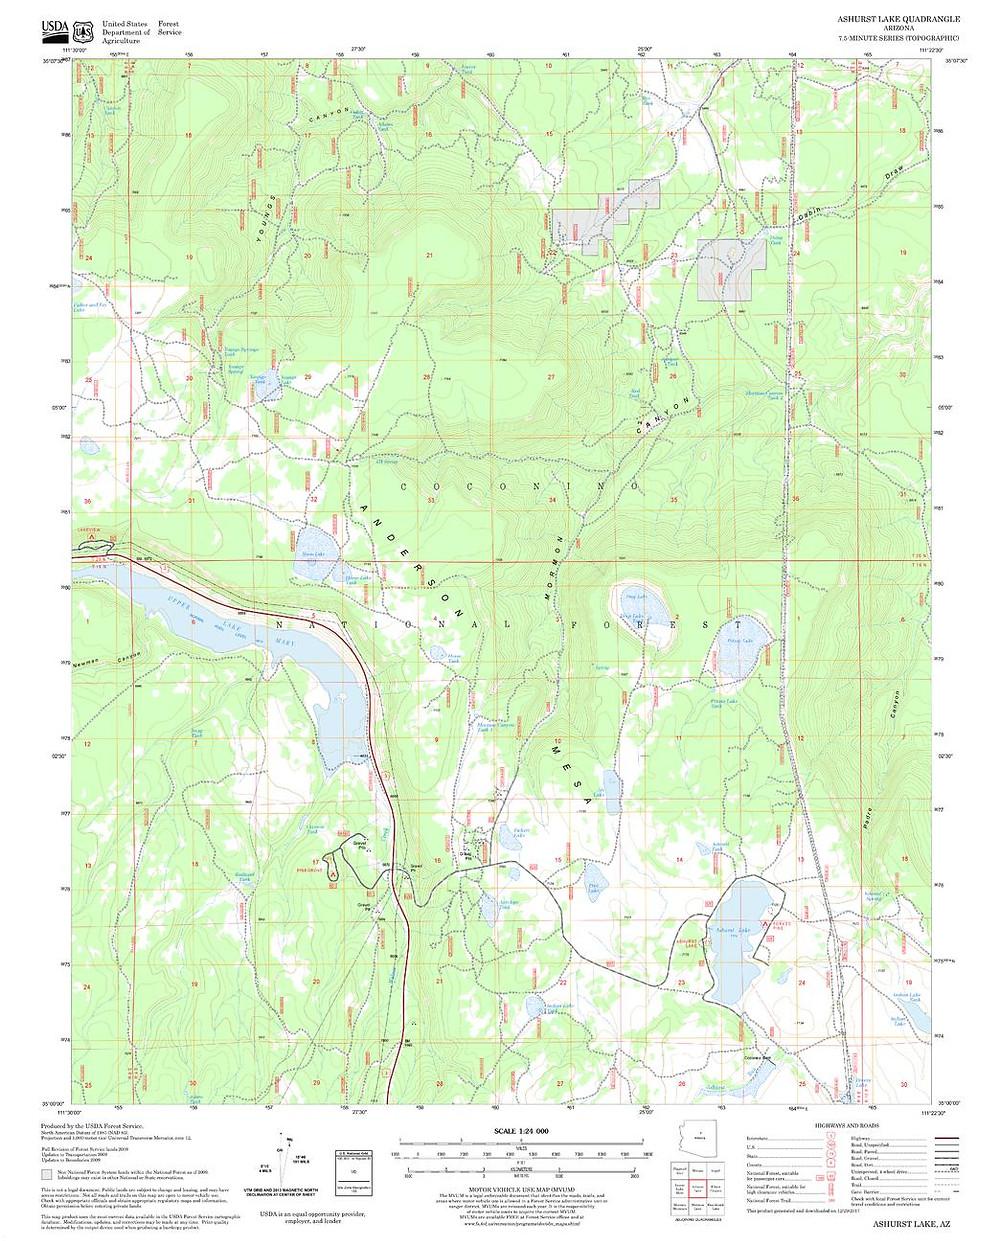 Sample USDA FS map